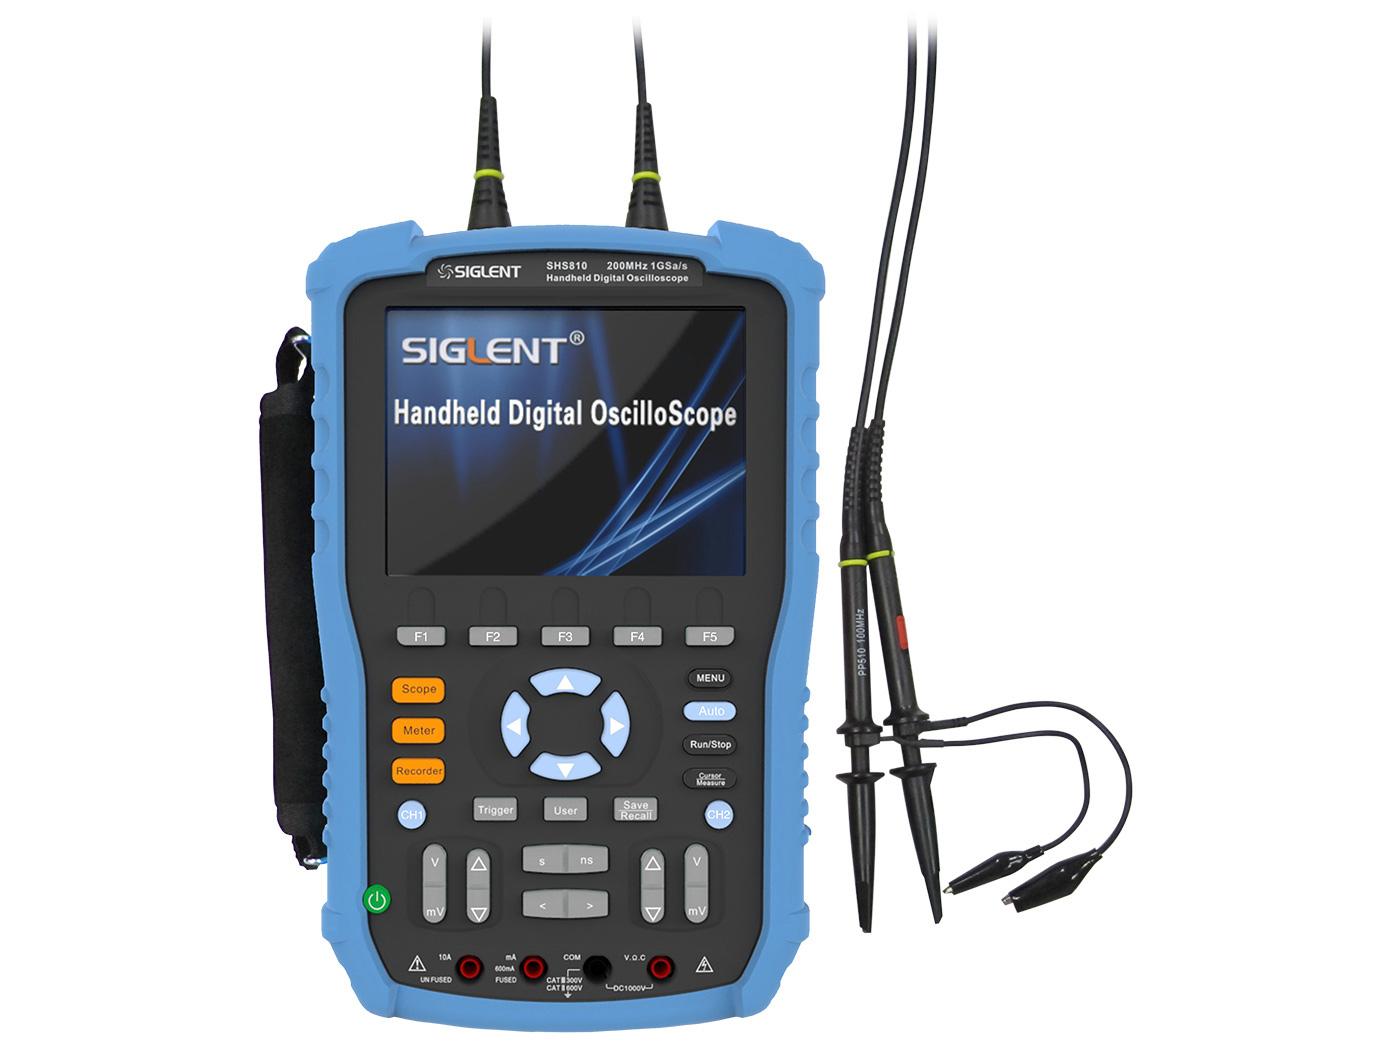 Oscilloscope 200MHz 2-ch handheld Siglent SHS820